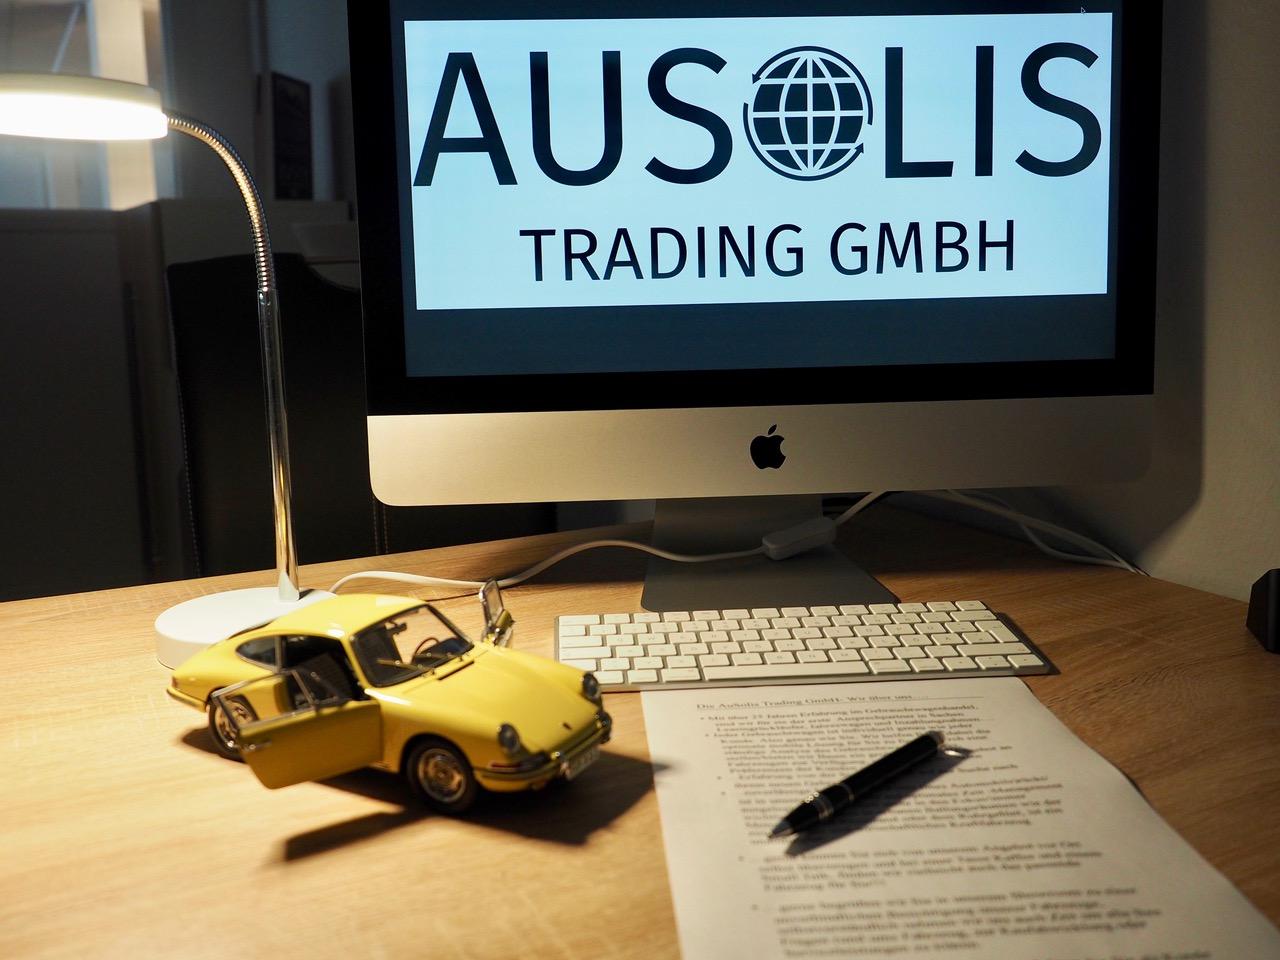 Ausolis Trading GmbH